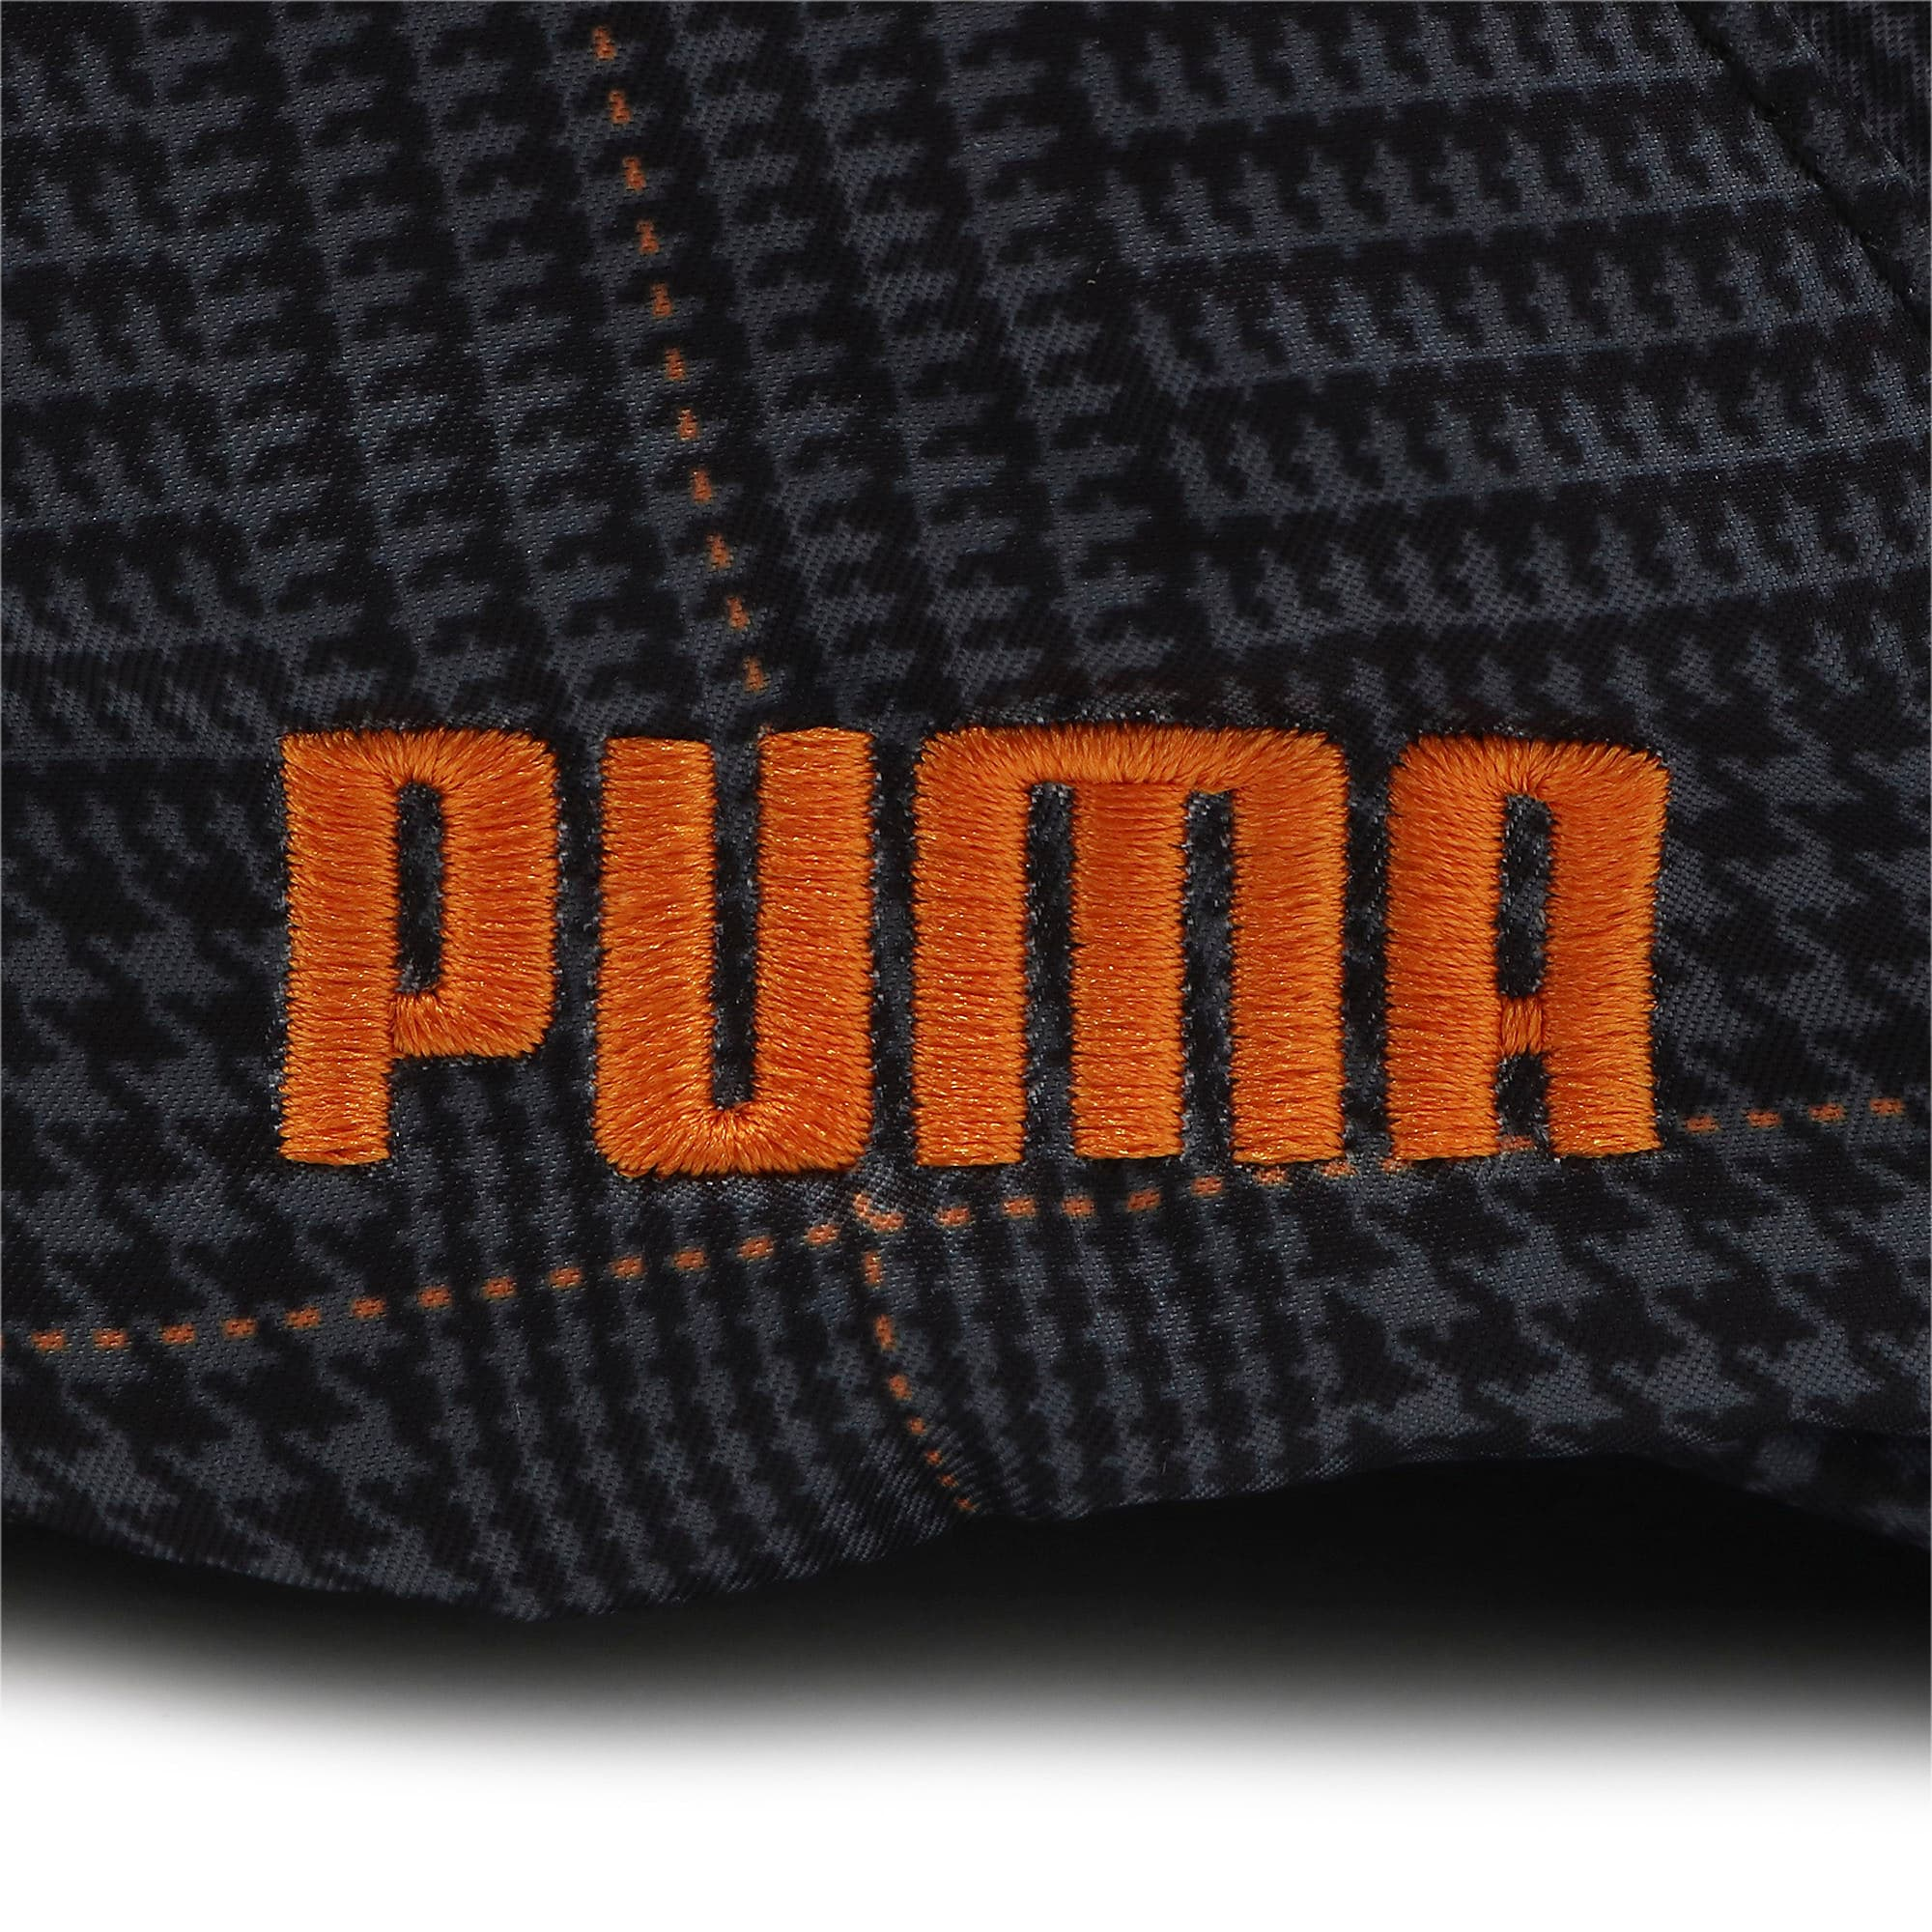 Thumbnail 5 of ゴルフ シーズナル ハンチングキャップ, Puma Black, medium-JPN